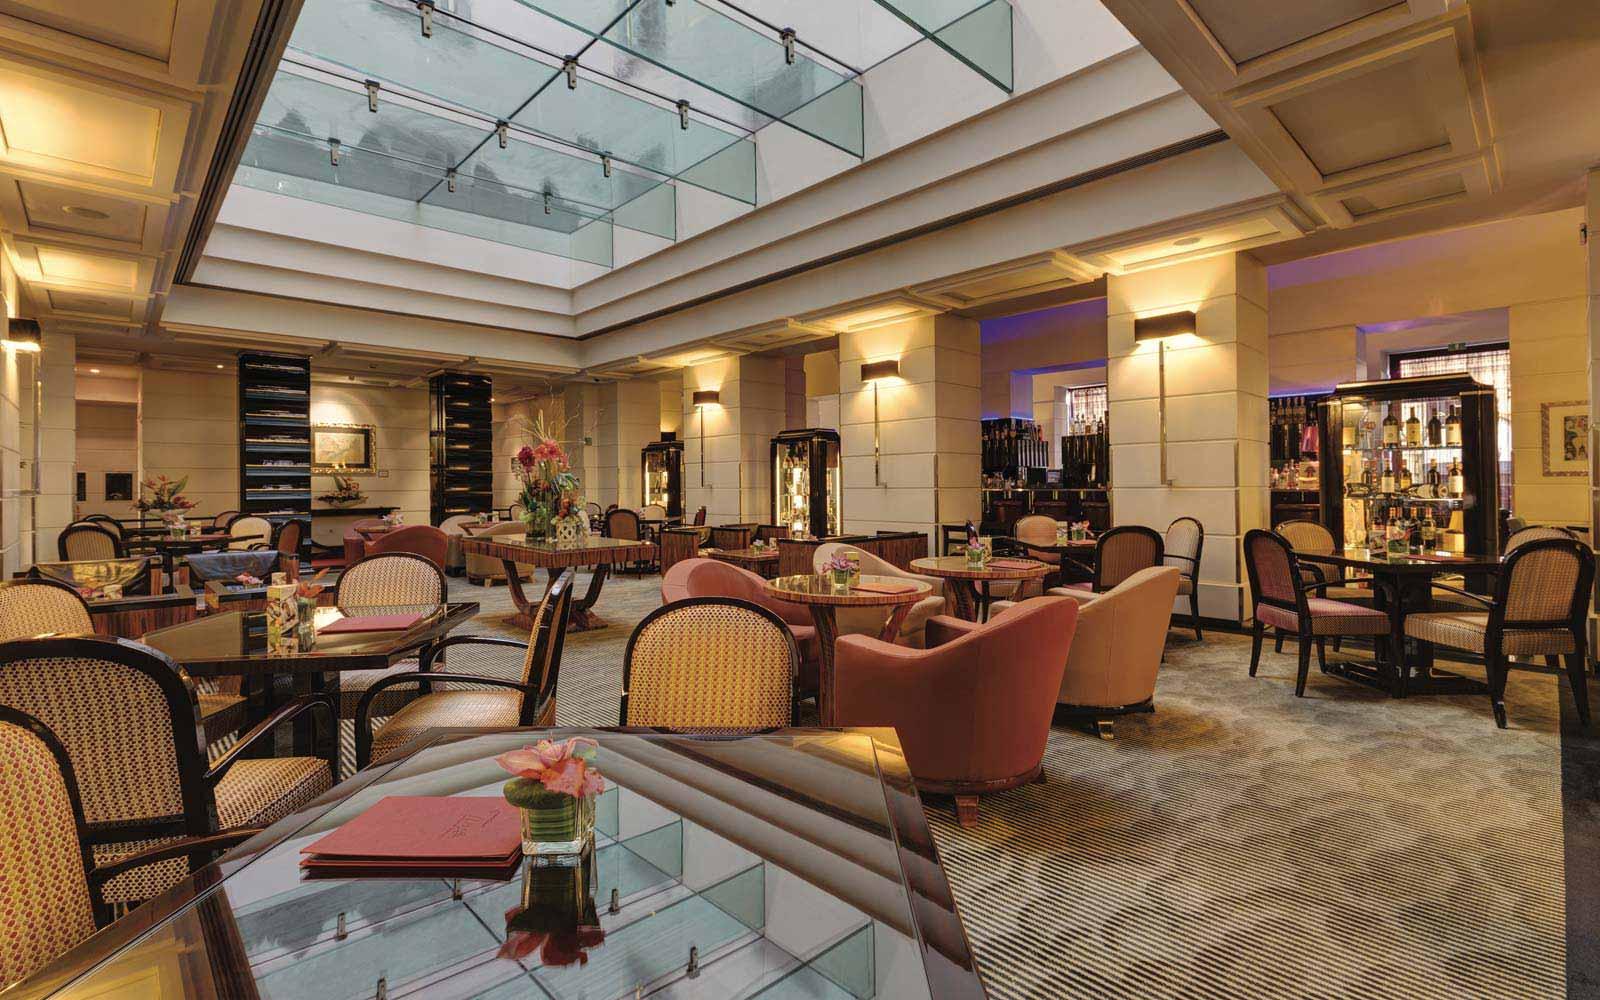 Lobby at the Grand Hotel Via Veneto